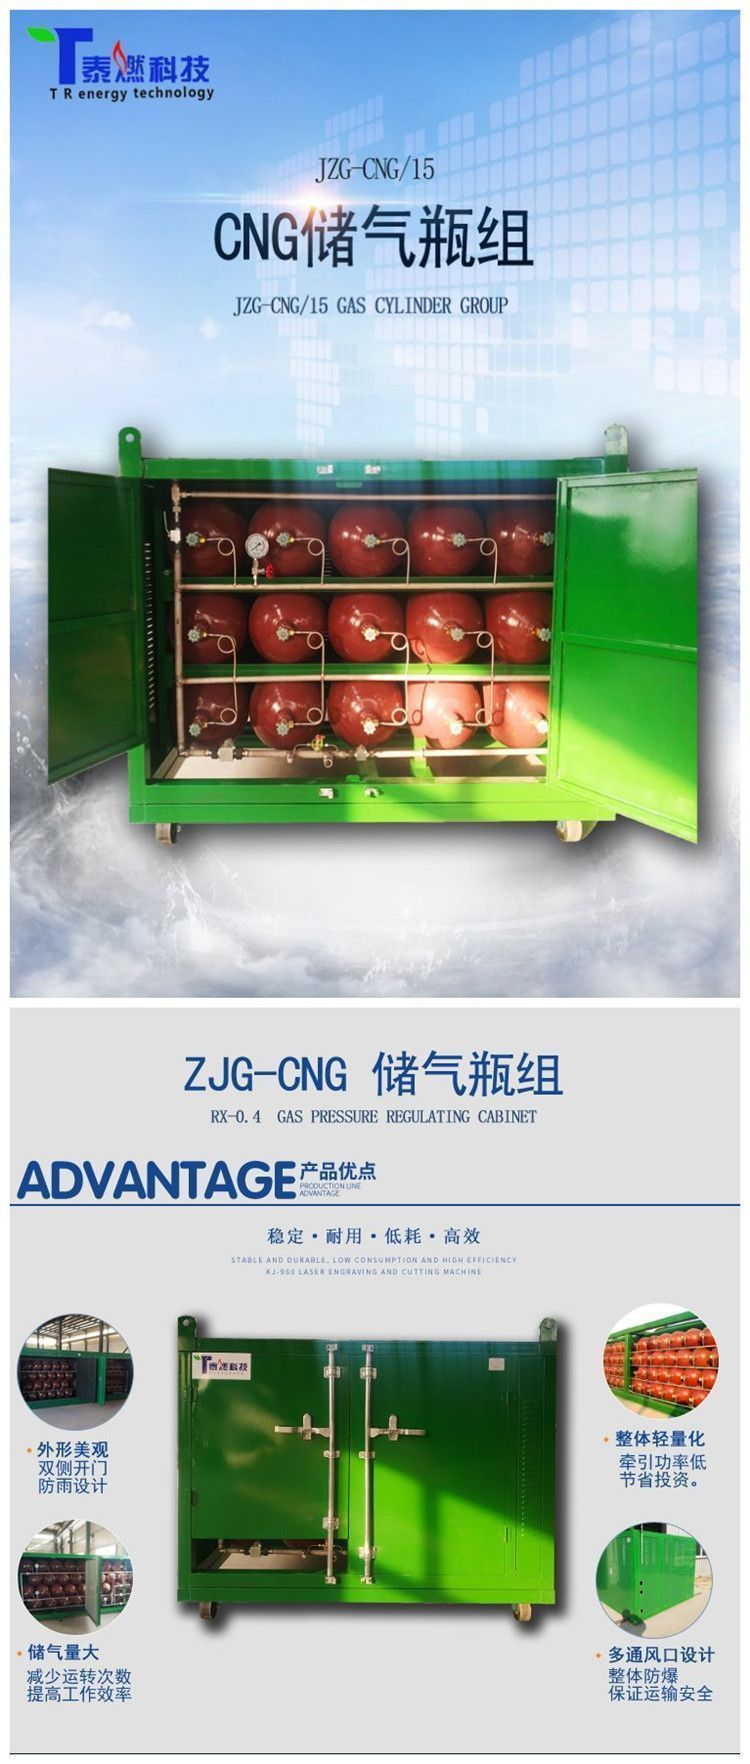 cng储气槽车规格_泰燃科技供应 天然气站储气瓶组 CNG储气瓶组 - 全球塑胶网